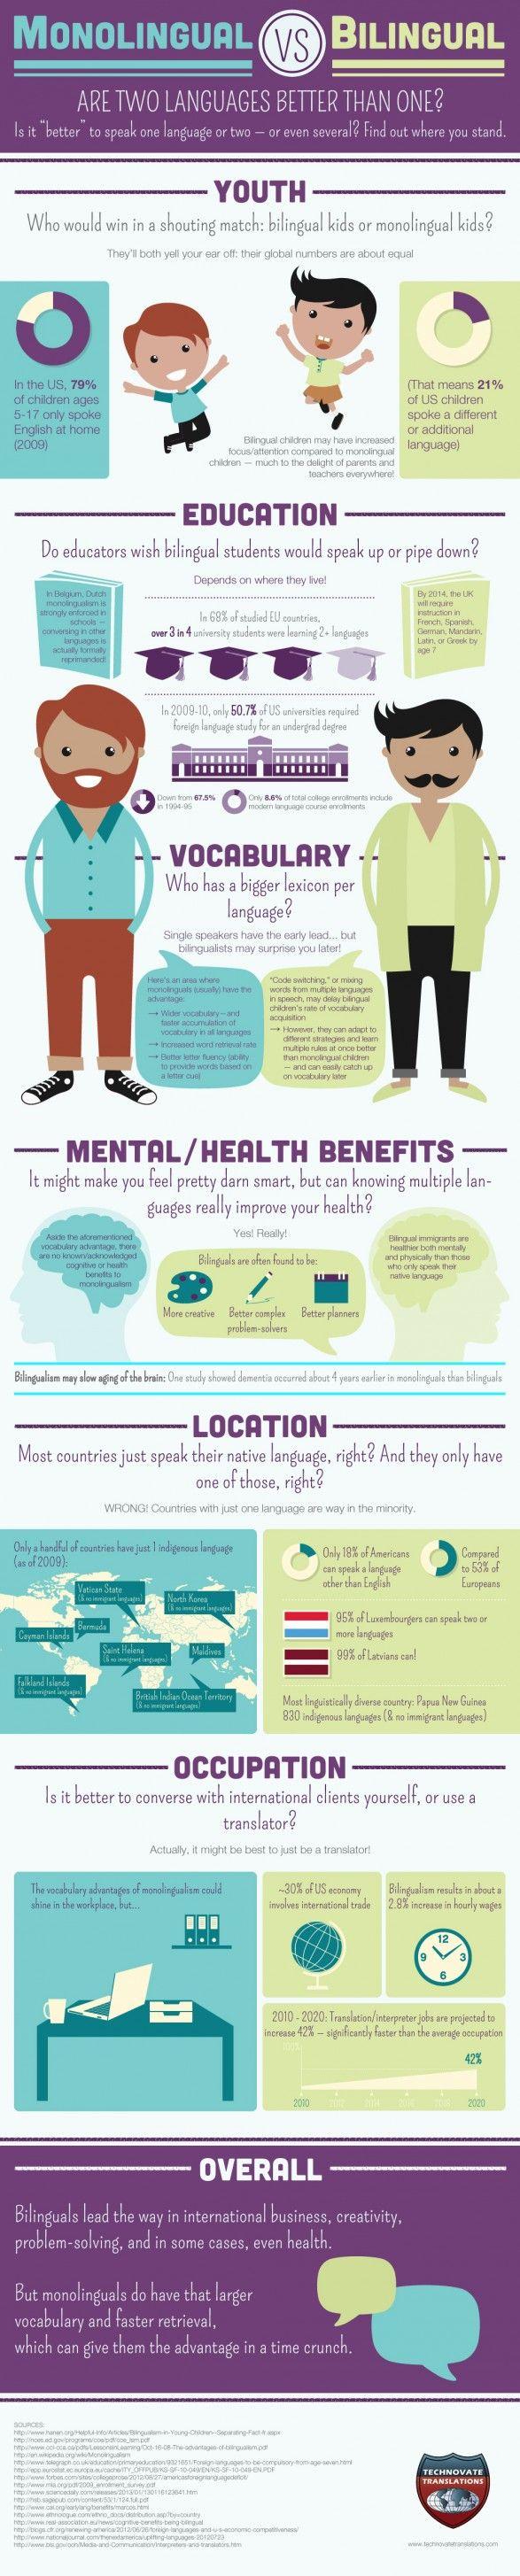 Benefits of a Bilingual Education